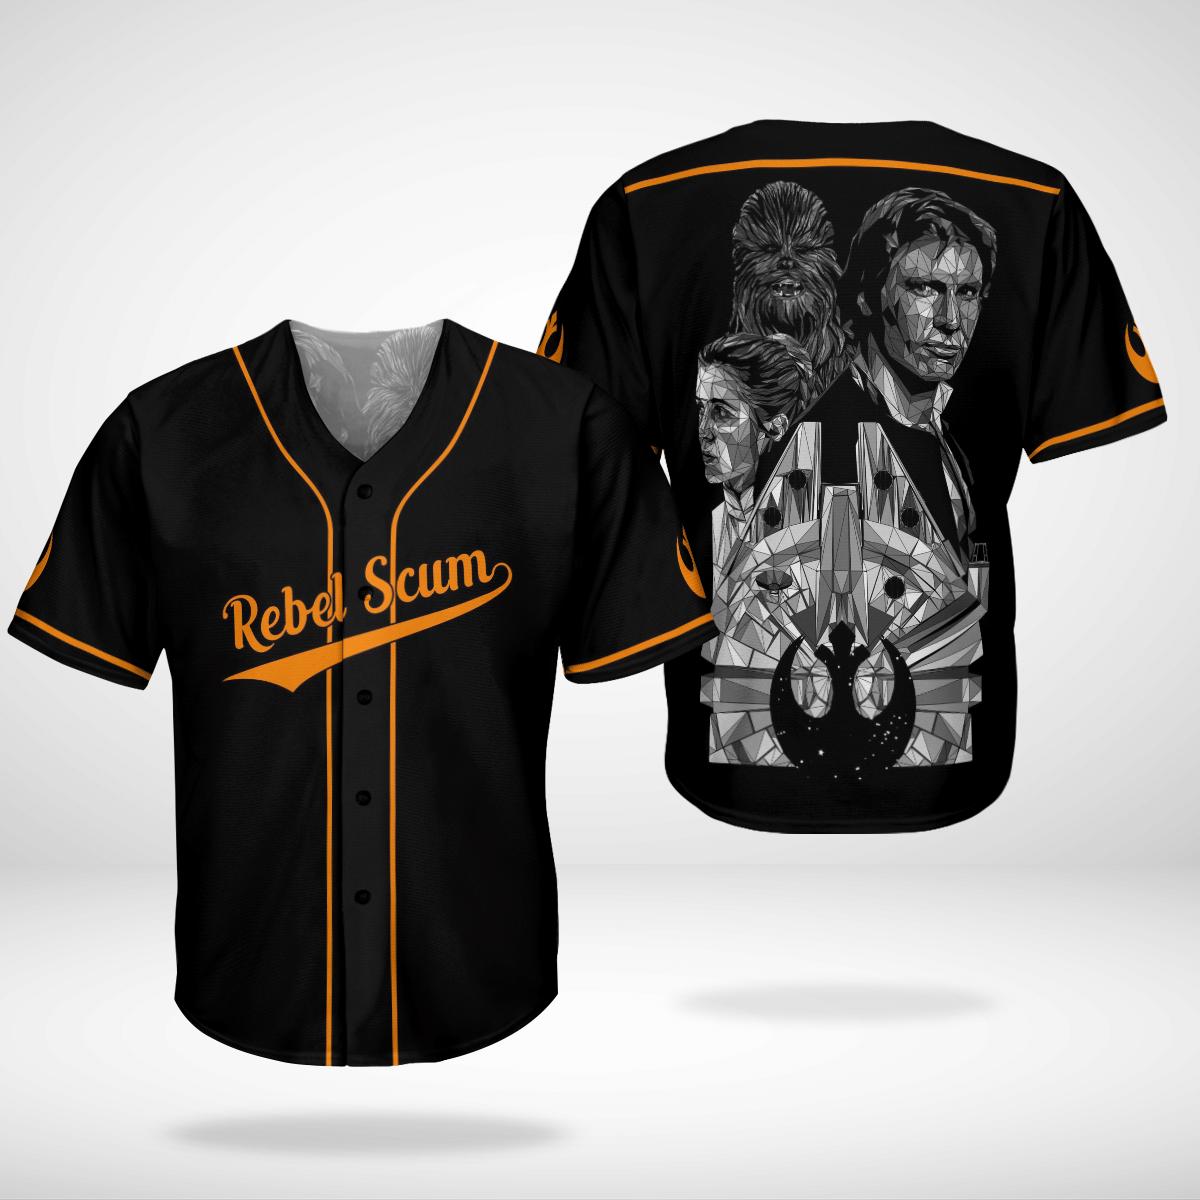 Rebel Scrum baseball shirt